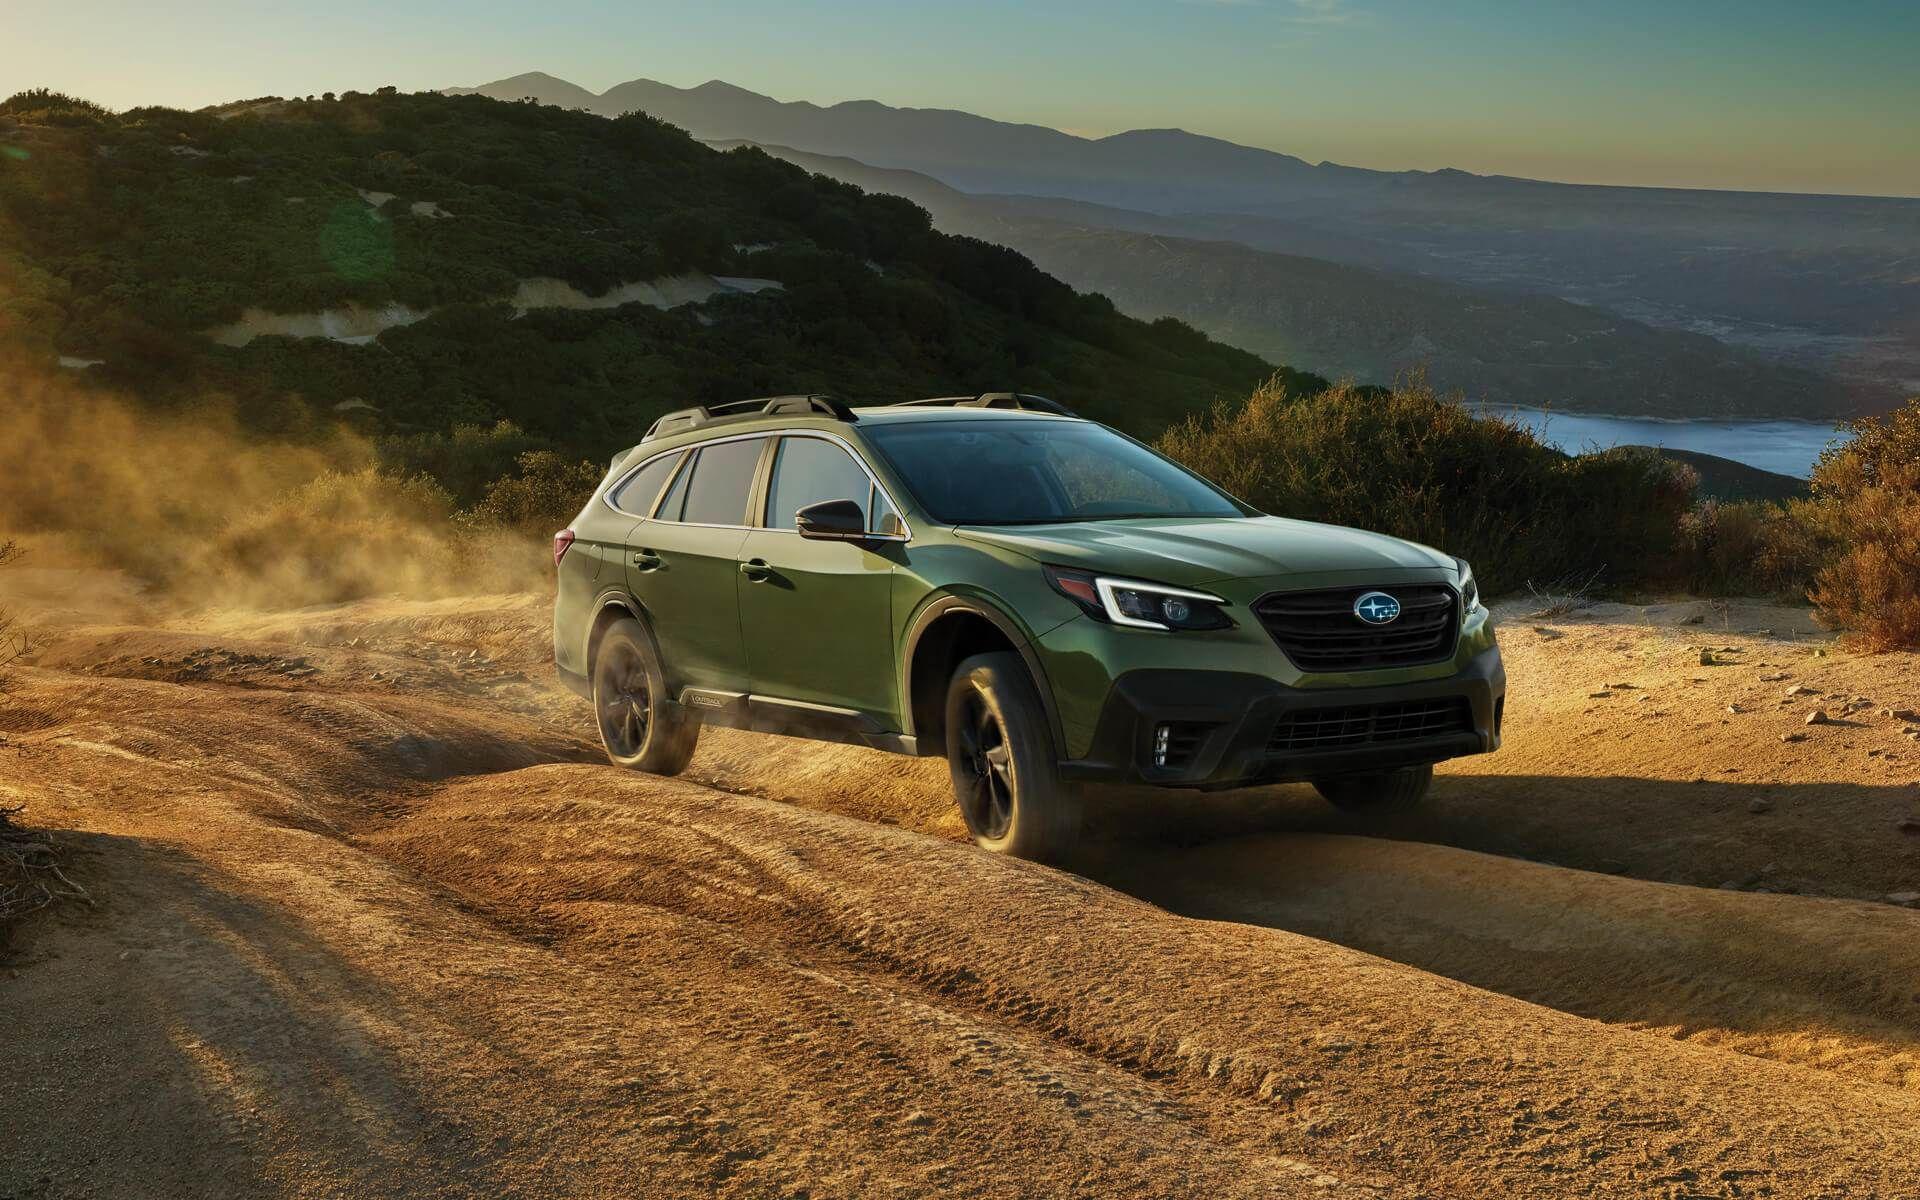 2020 Subaru Outback Voiture